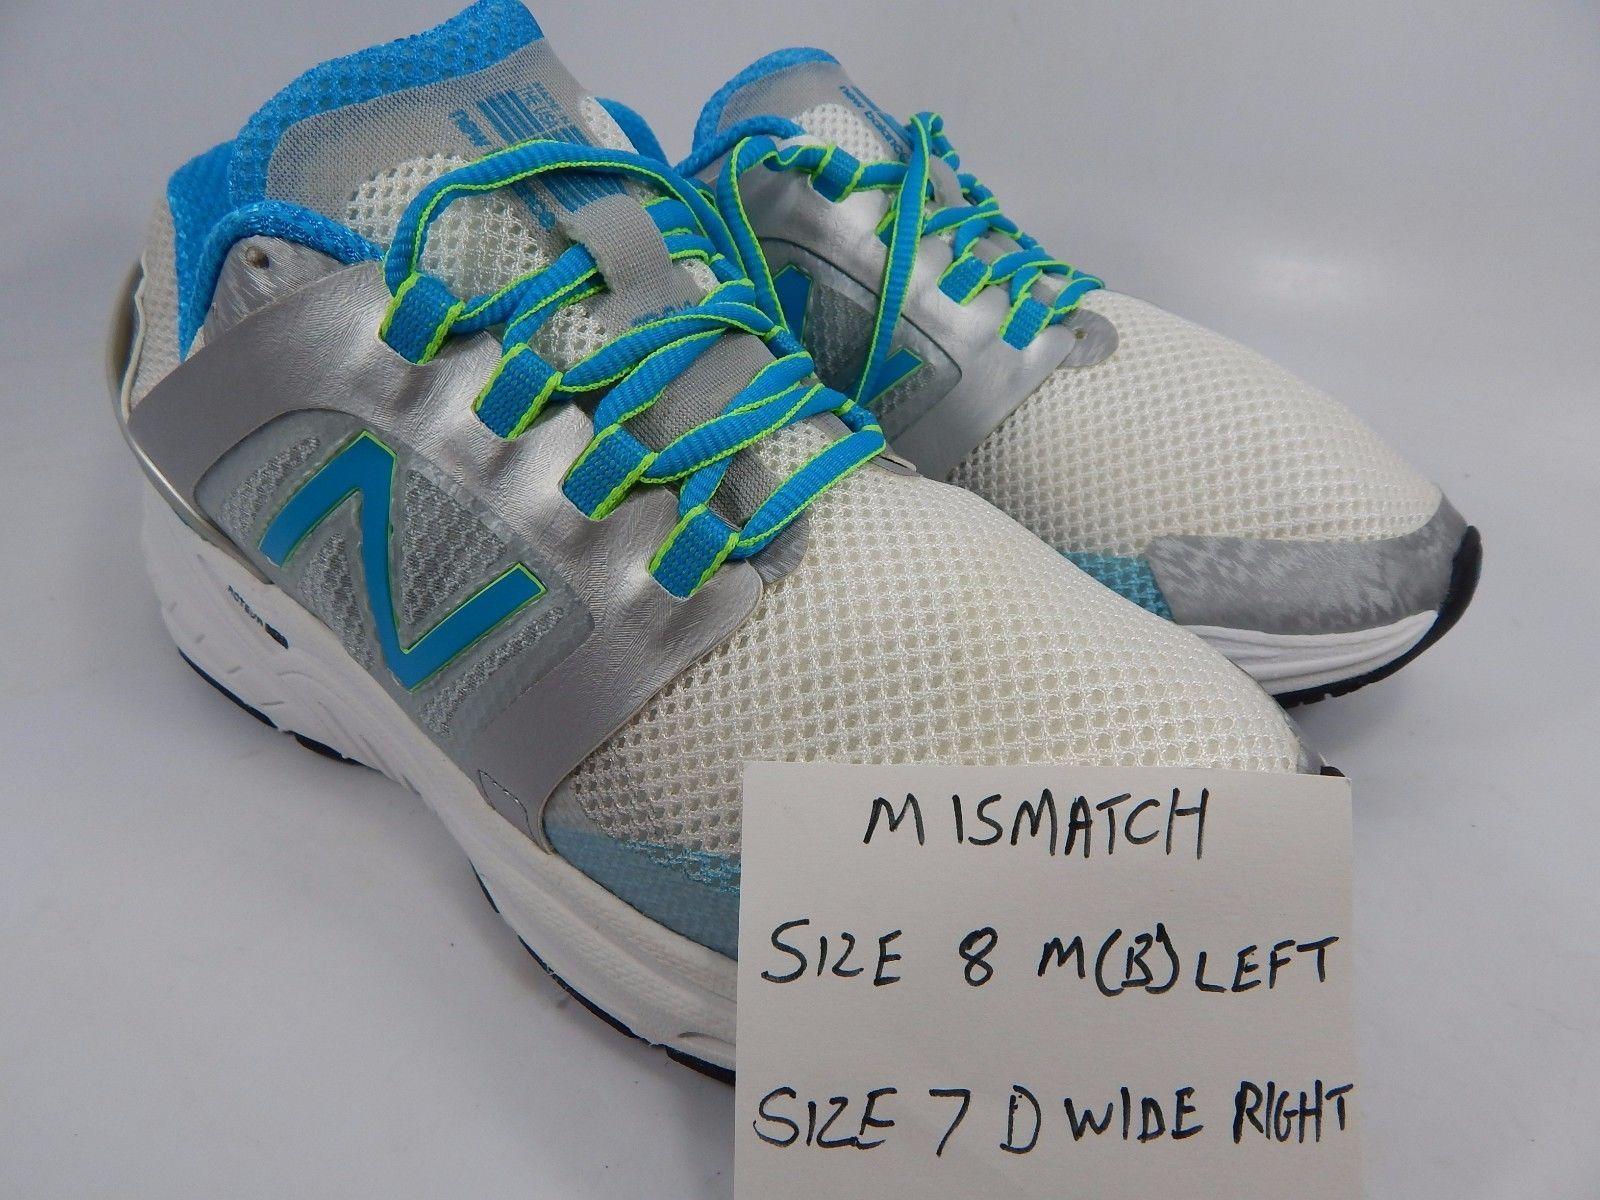 MISMATCH New Balance 3040 v1 Women's Shoes Size 8 M (B) Left & 7 D WIDE Right